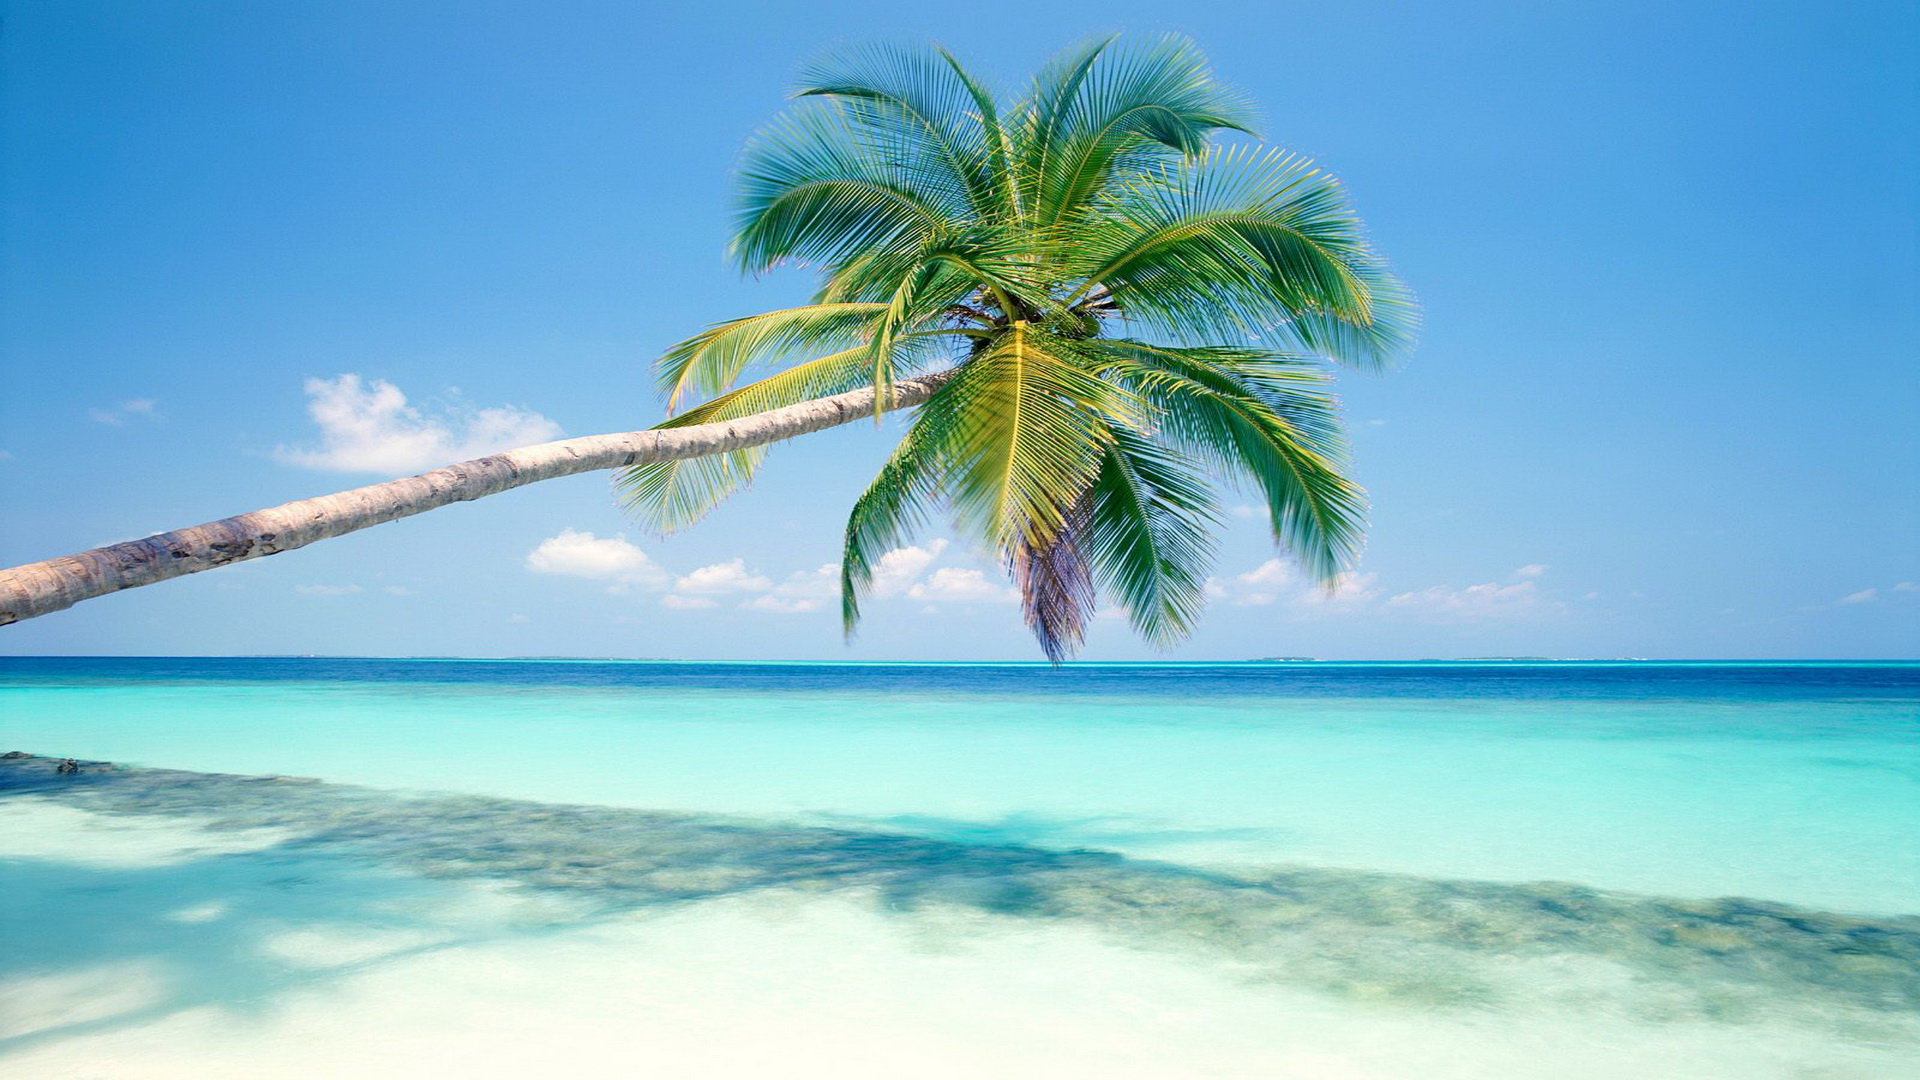 tropical island HD Wallpapers Wallpaper HD Desktop 1920x1080